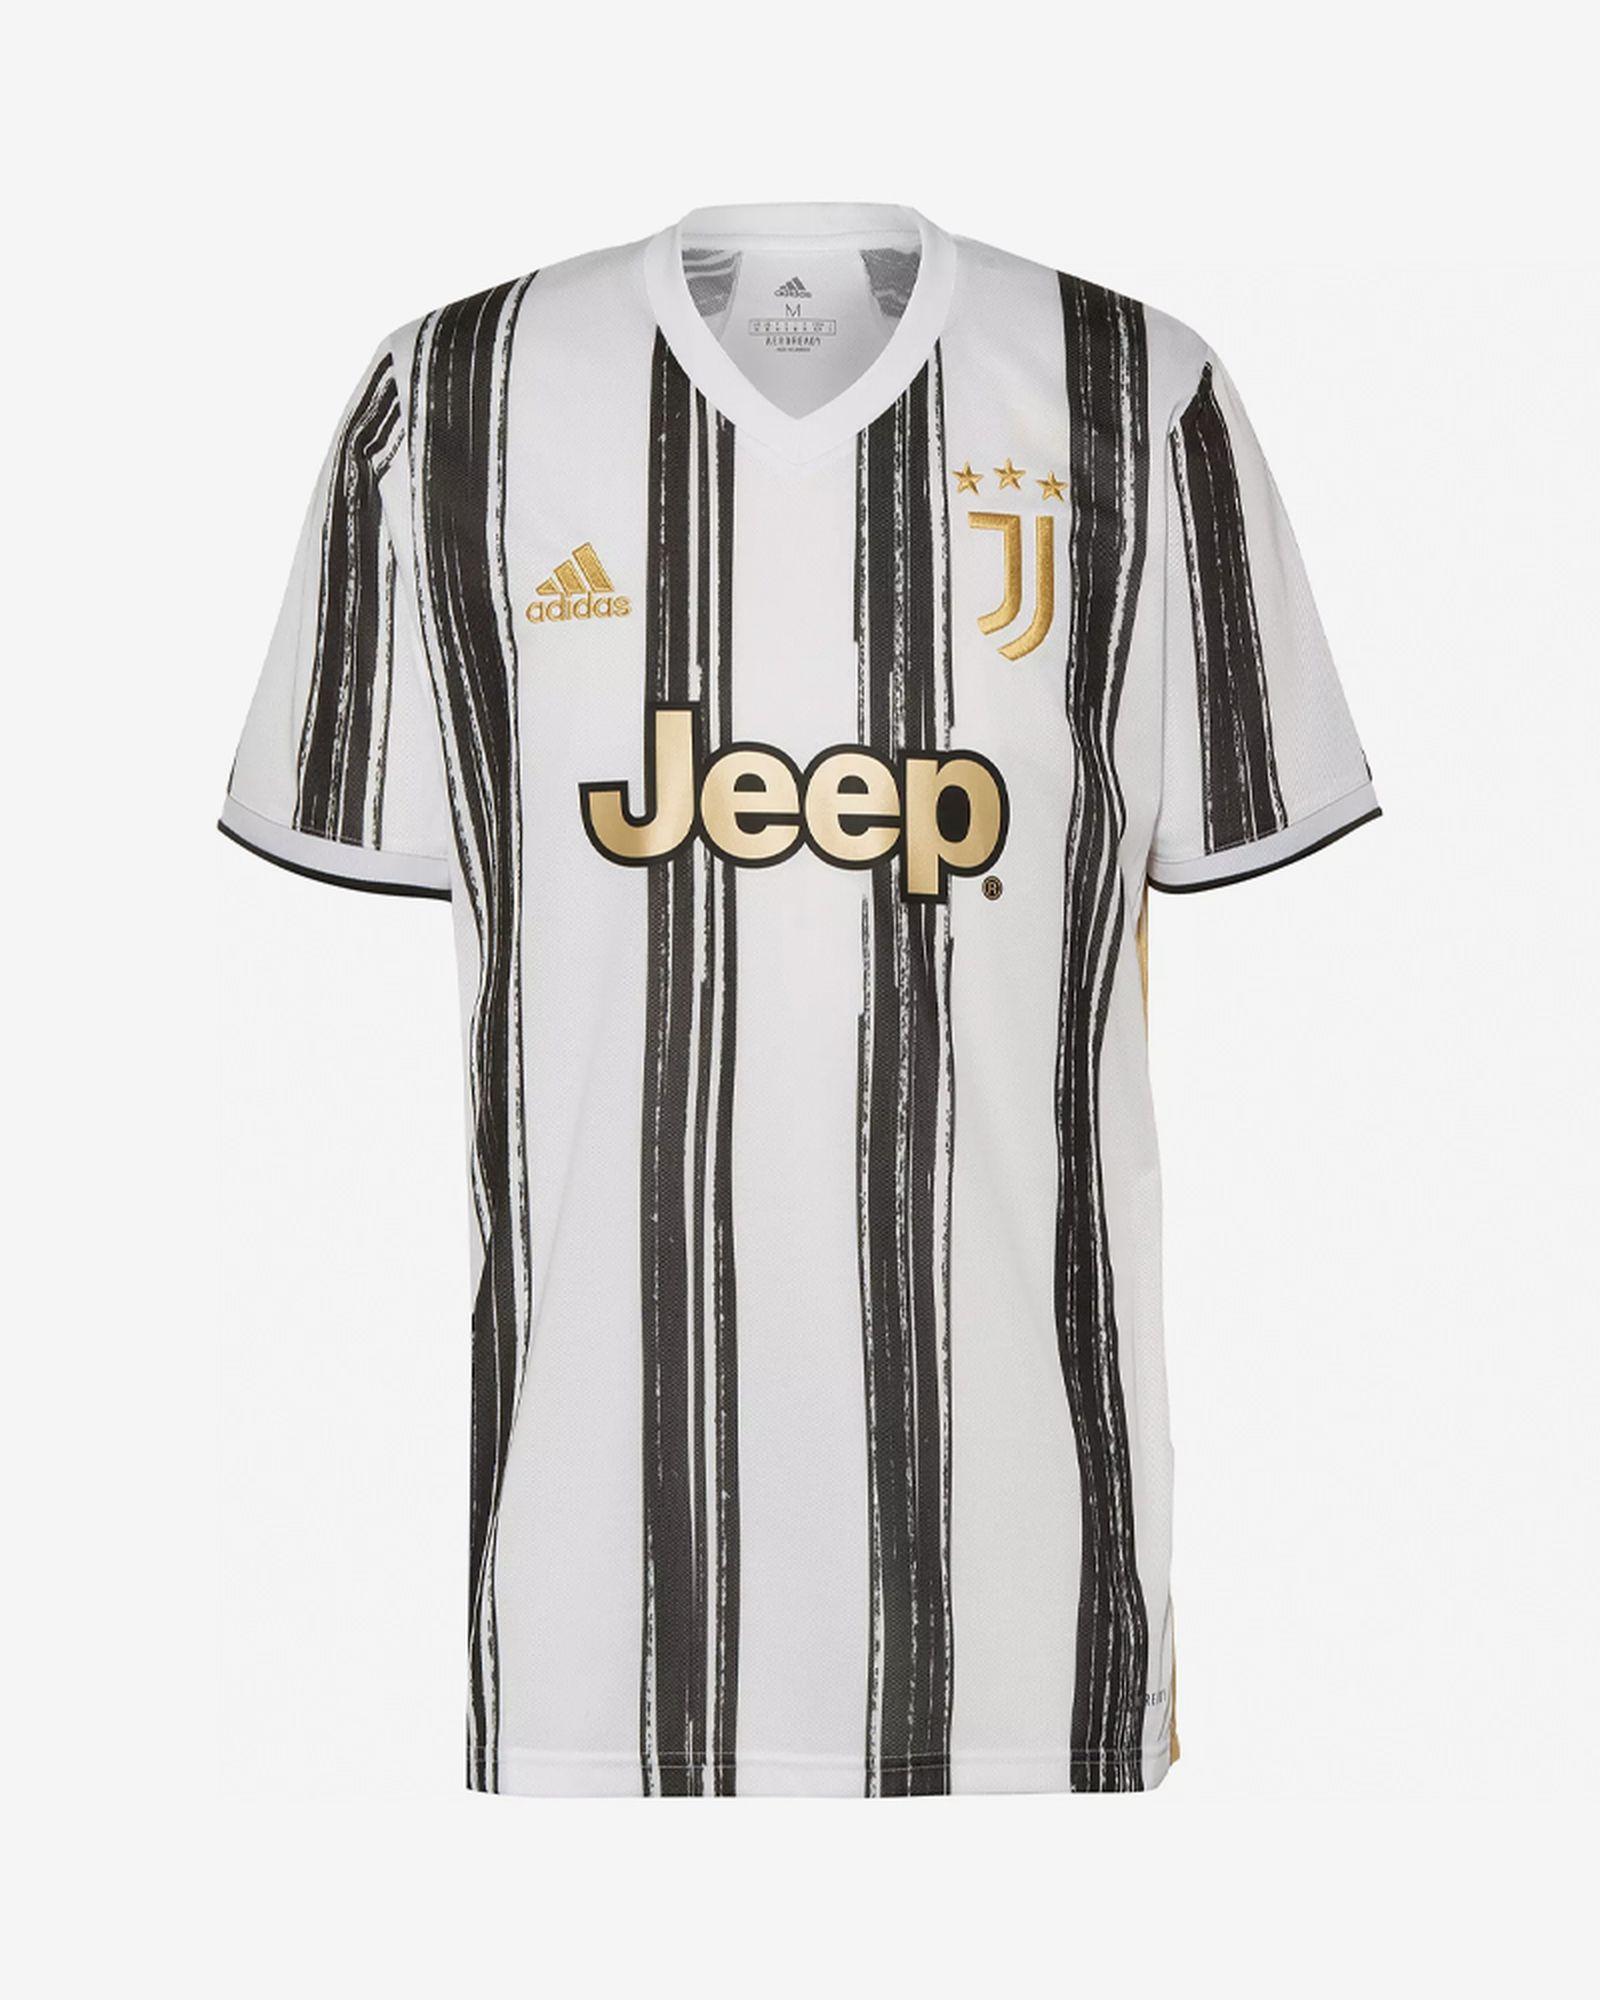 football-shirts-2020-review-06